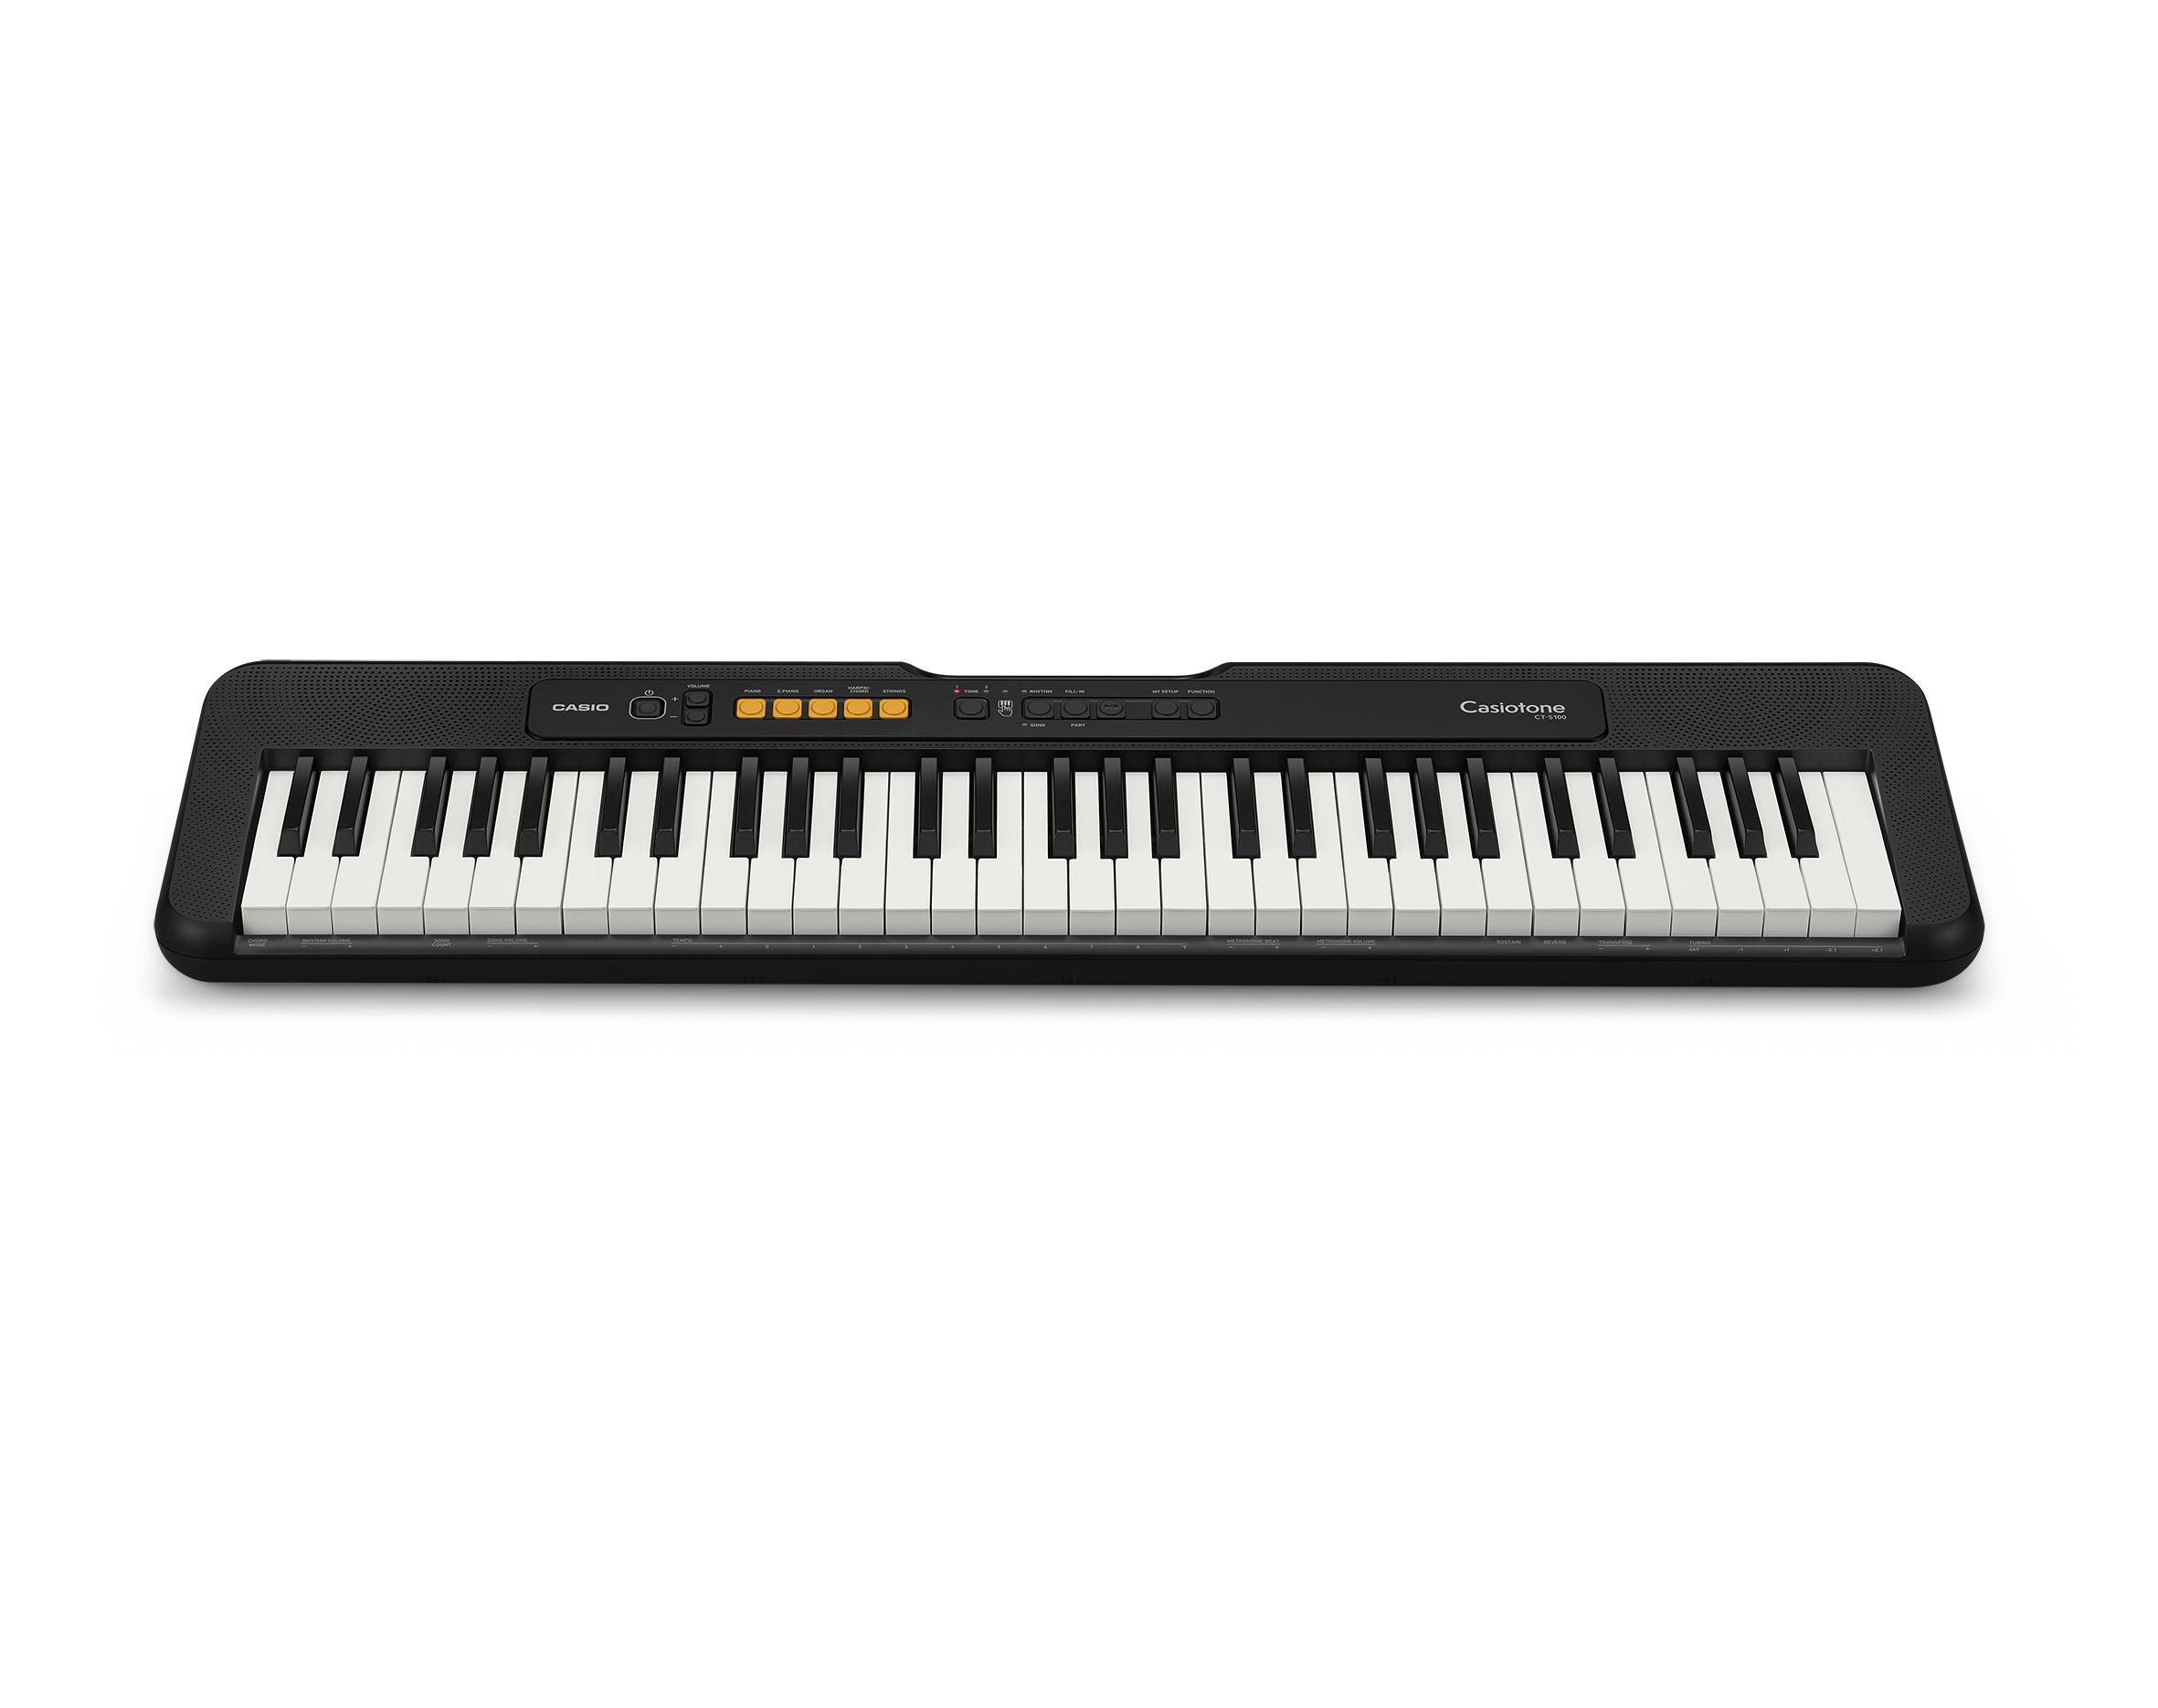 Casio CT-S100 Keyboard